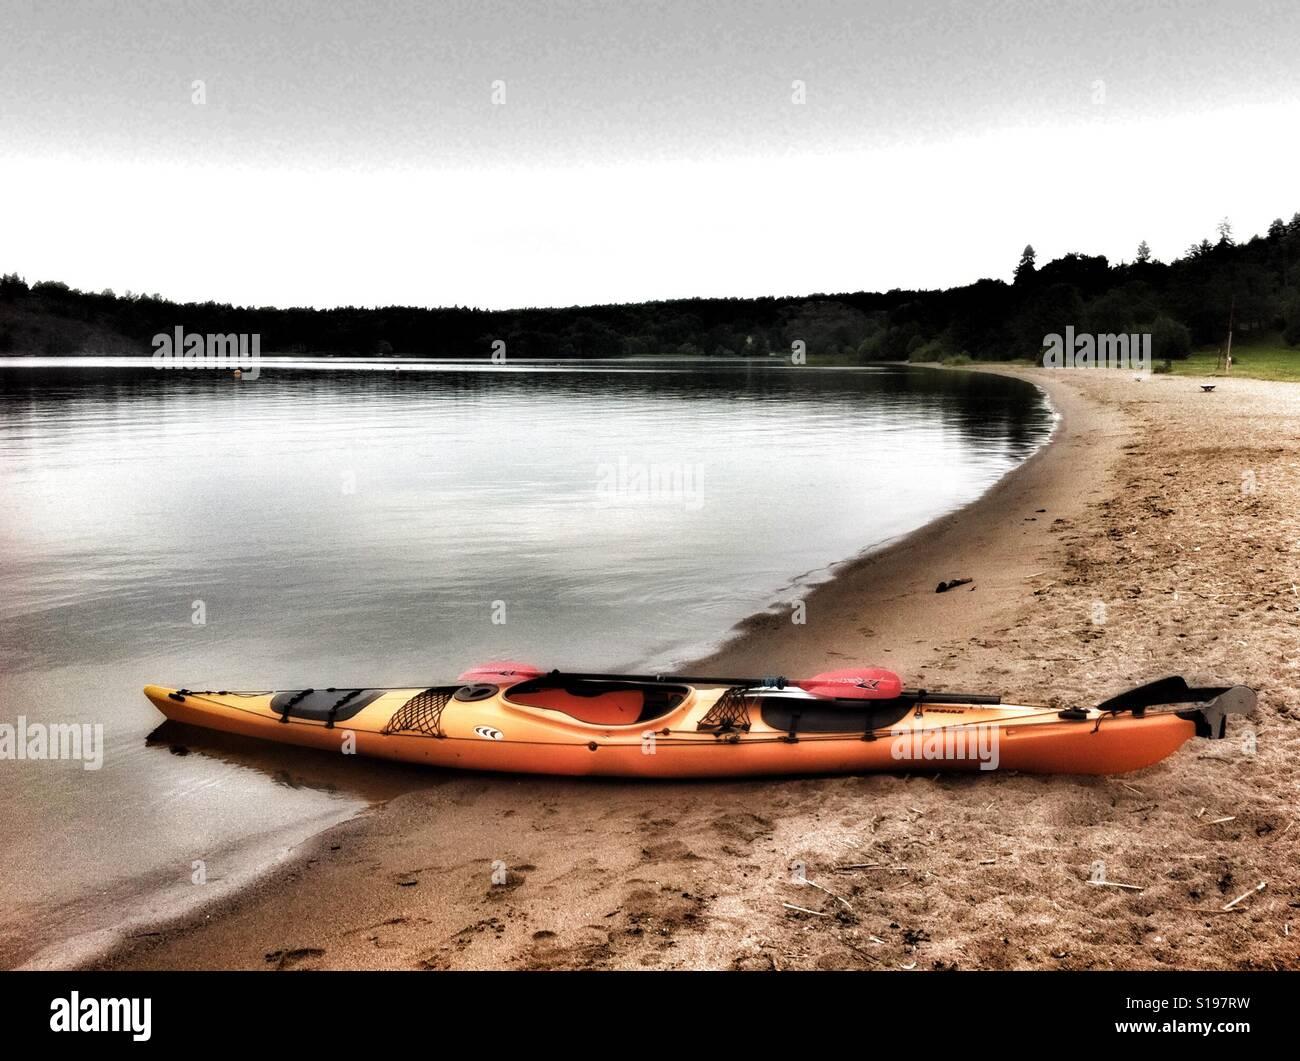 Kodiak Prijon kayak à Sätra, Suède Banque D'Images